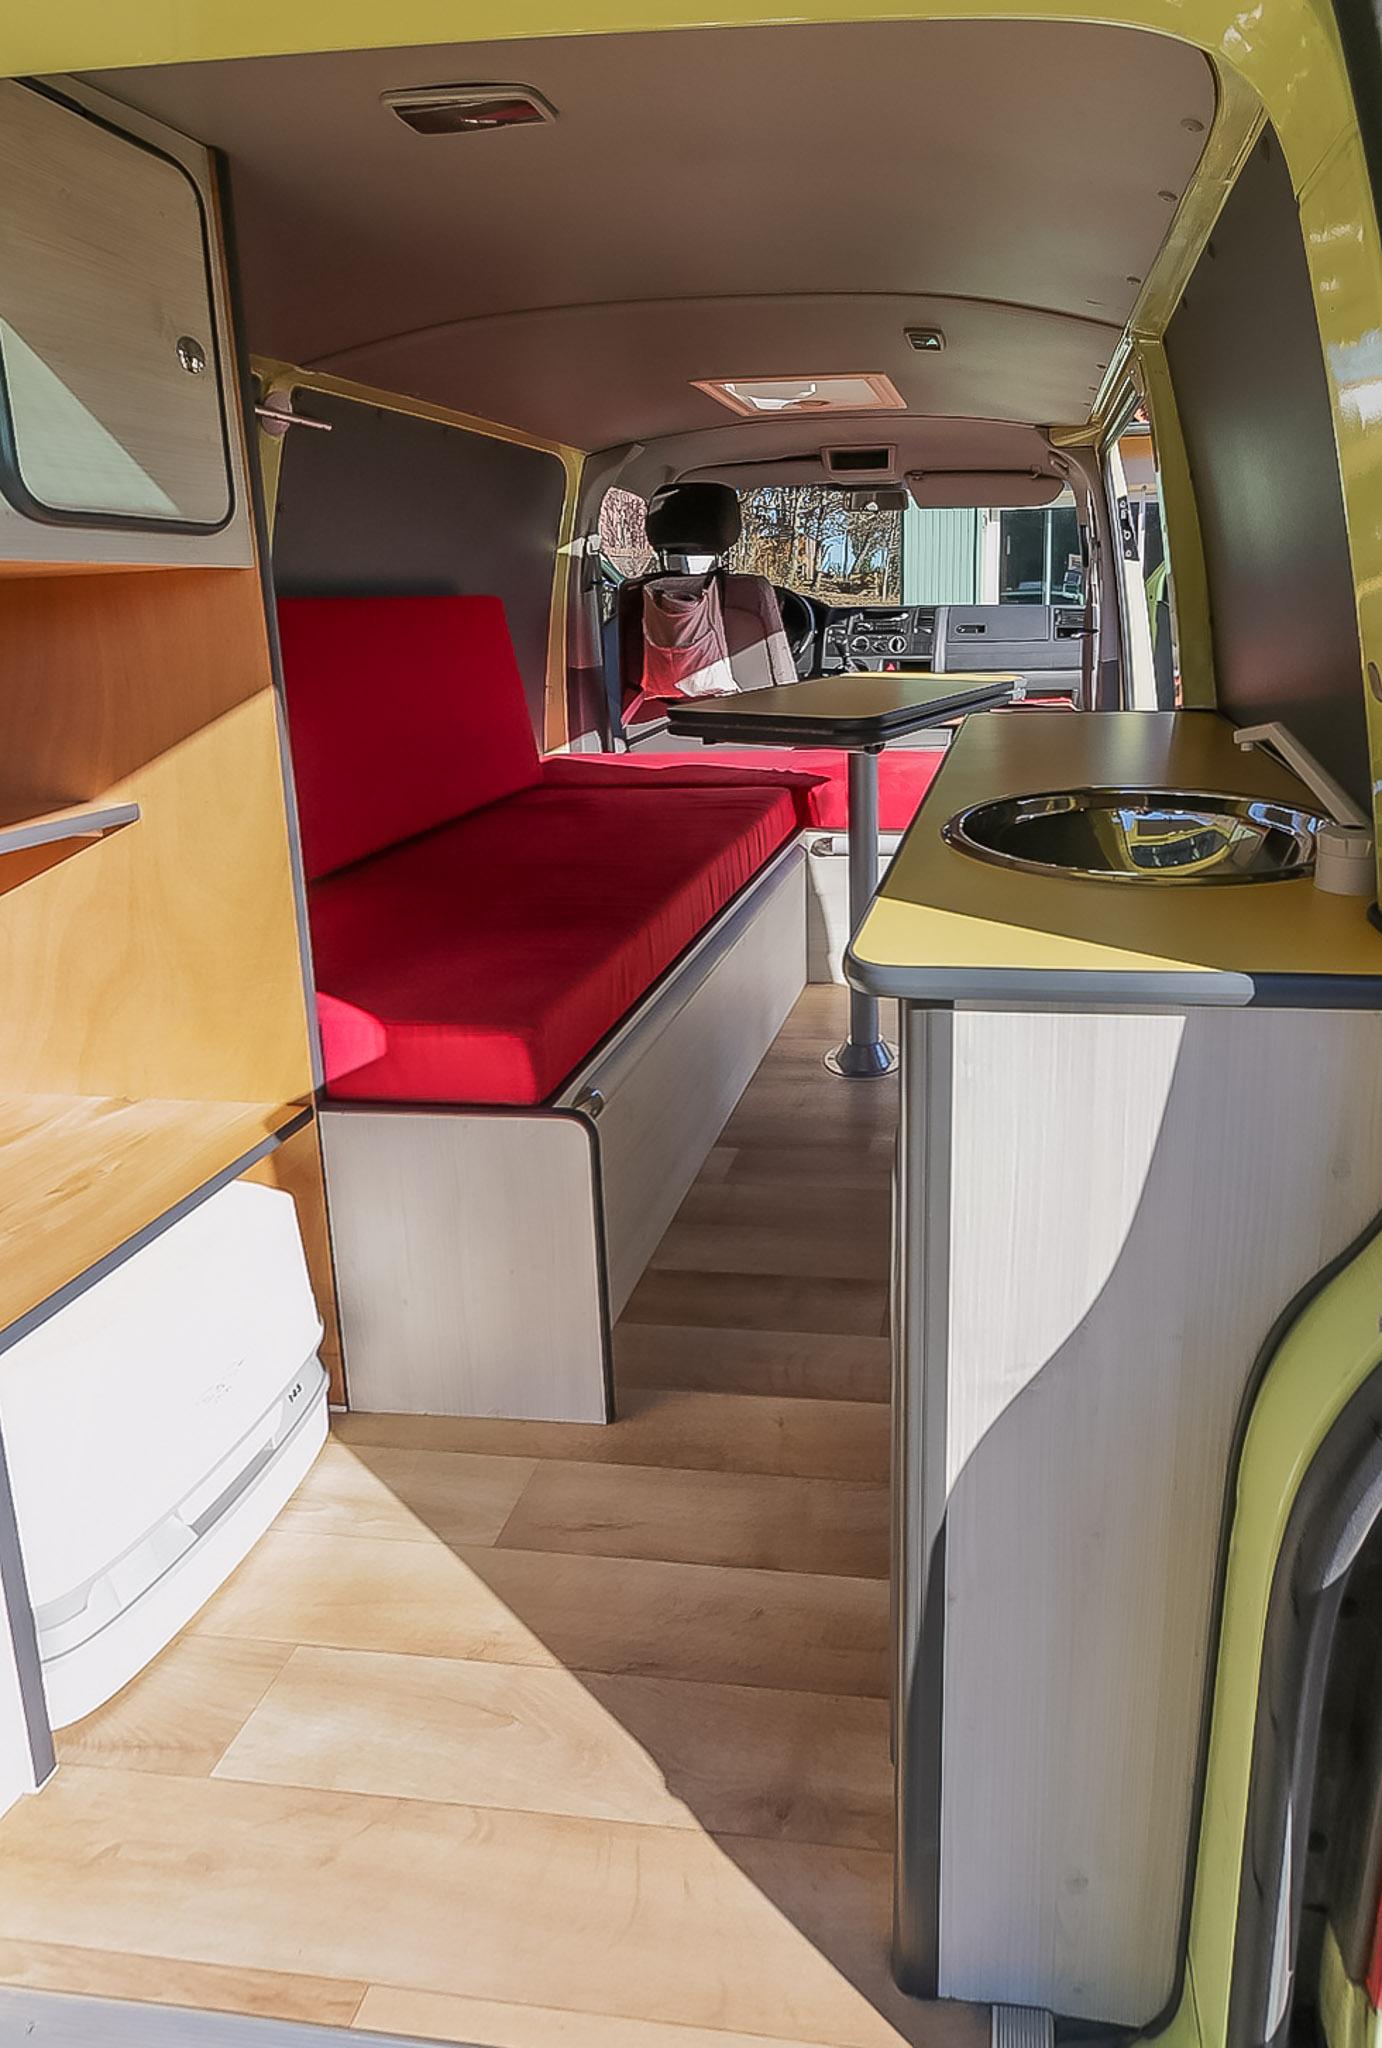 kits d 39 am nagement fourgon camping car smartcombee. Black Bedroom Furniture Sets. Home Design Ideas